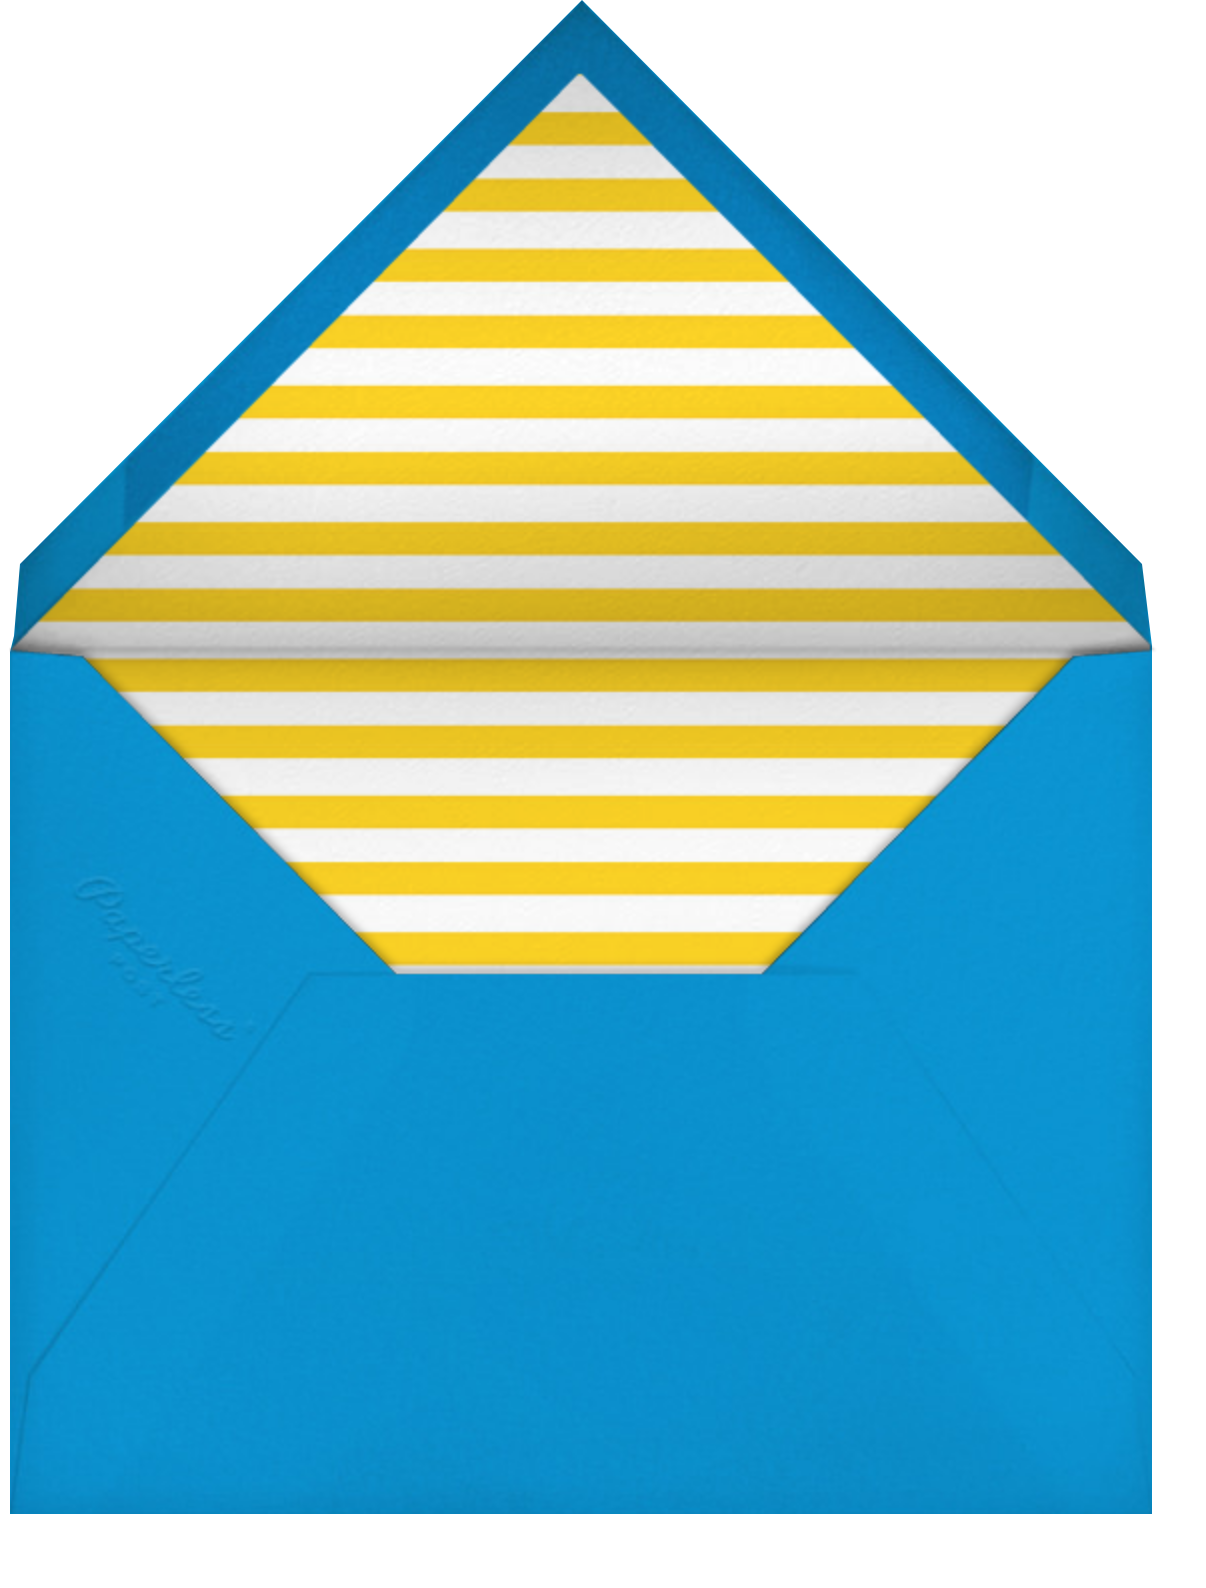 Quint - Citrus/Silver - Paperless Post - Kids' birthday - envelope back